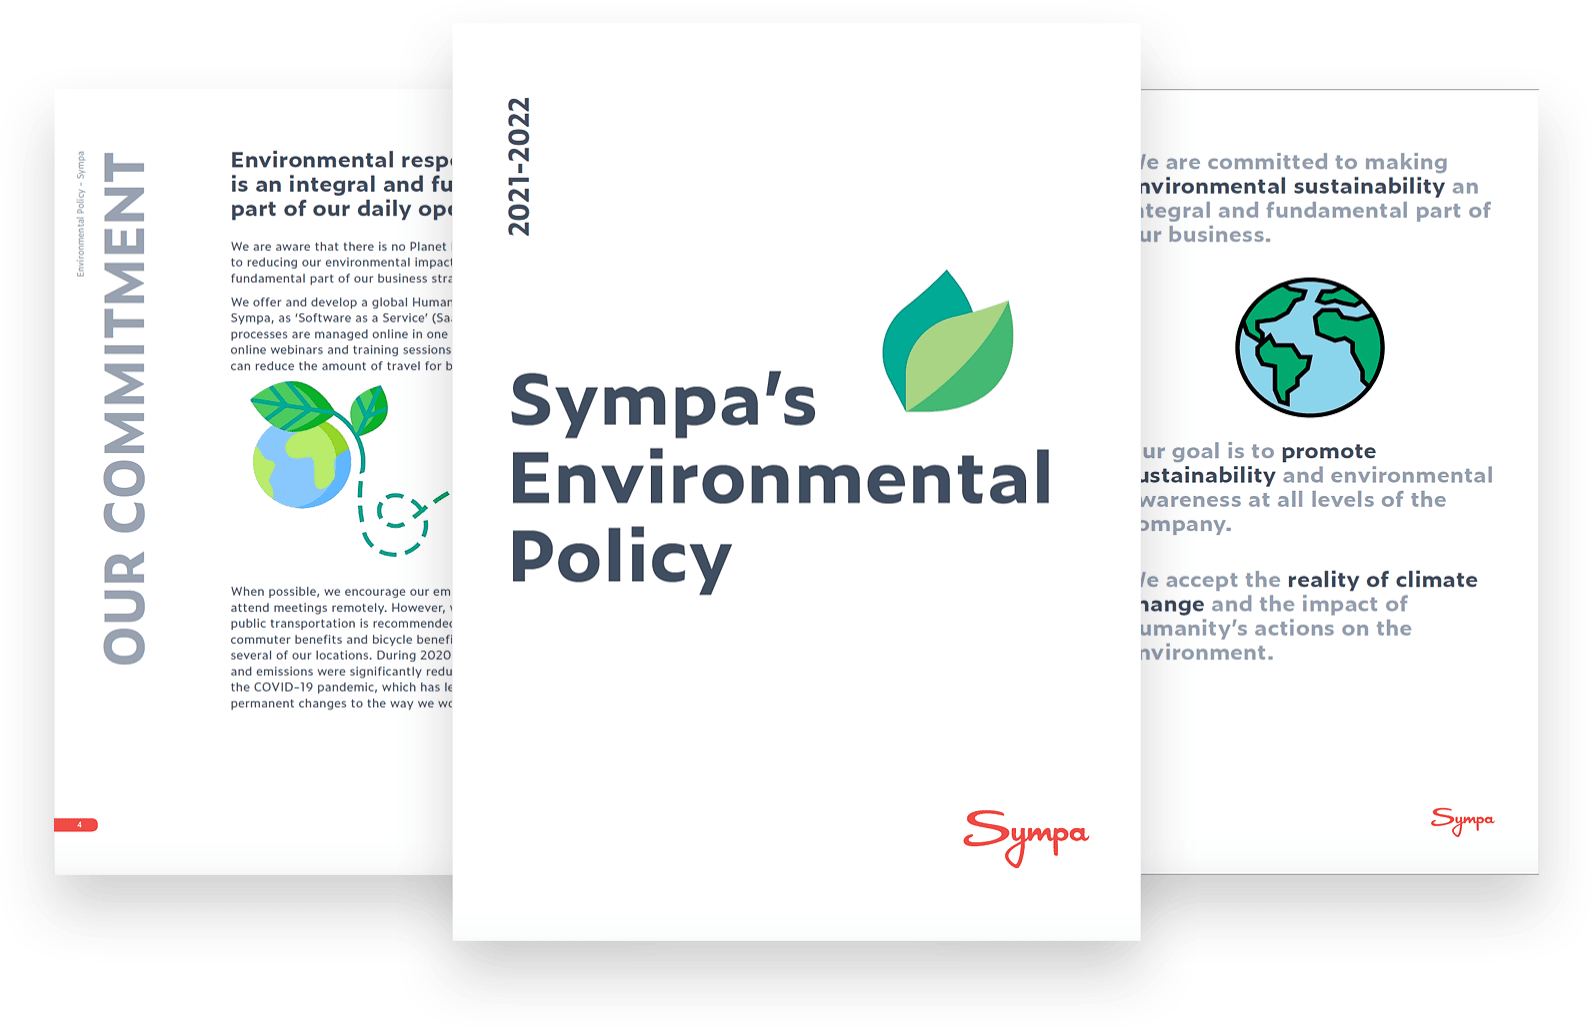 Sympa's Environmental Policy